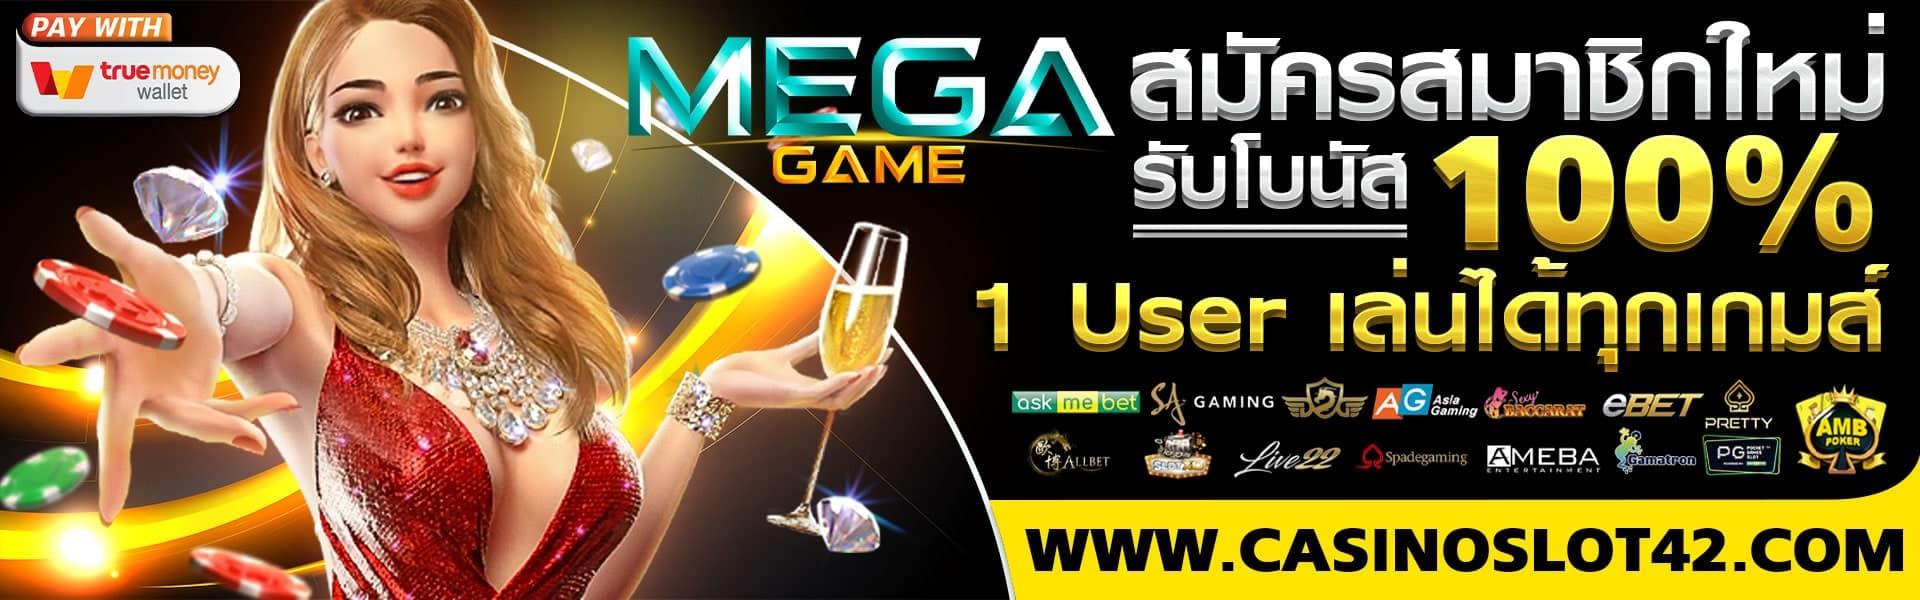 mega game สล็อต